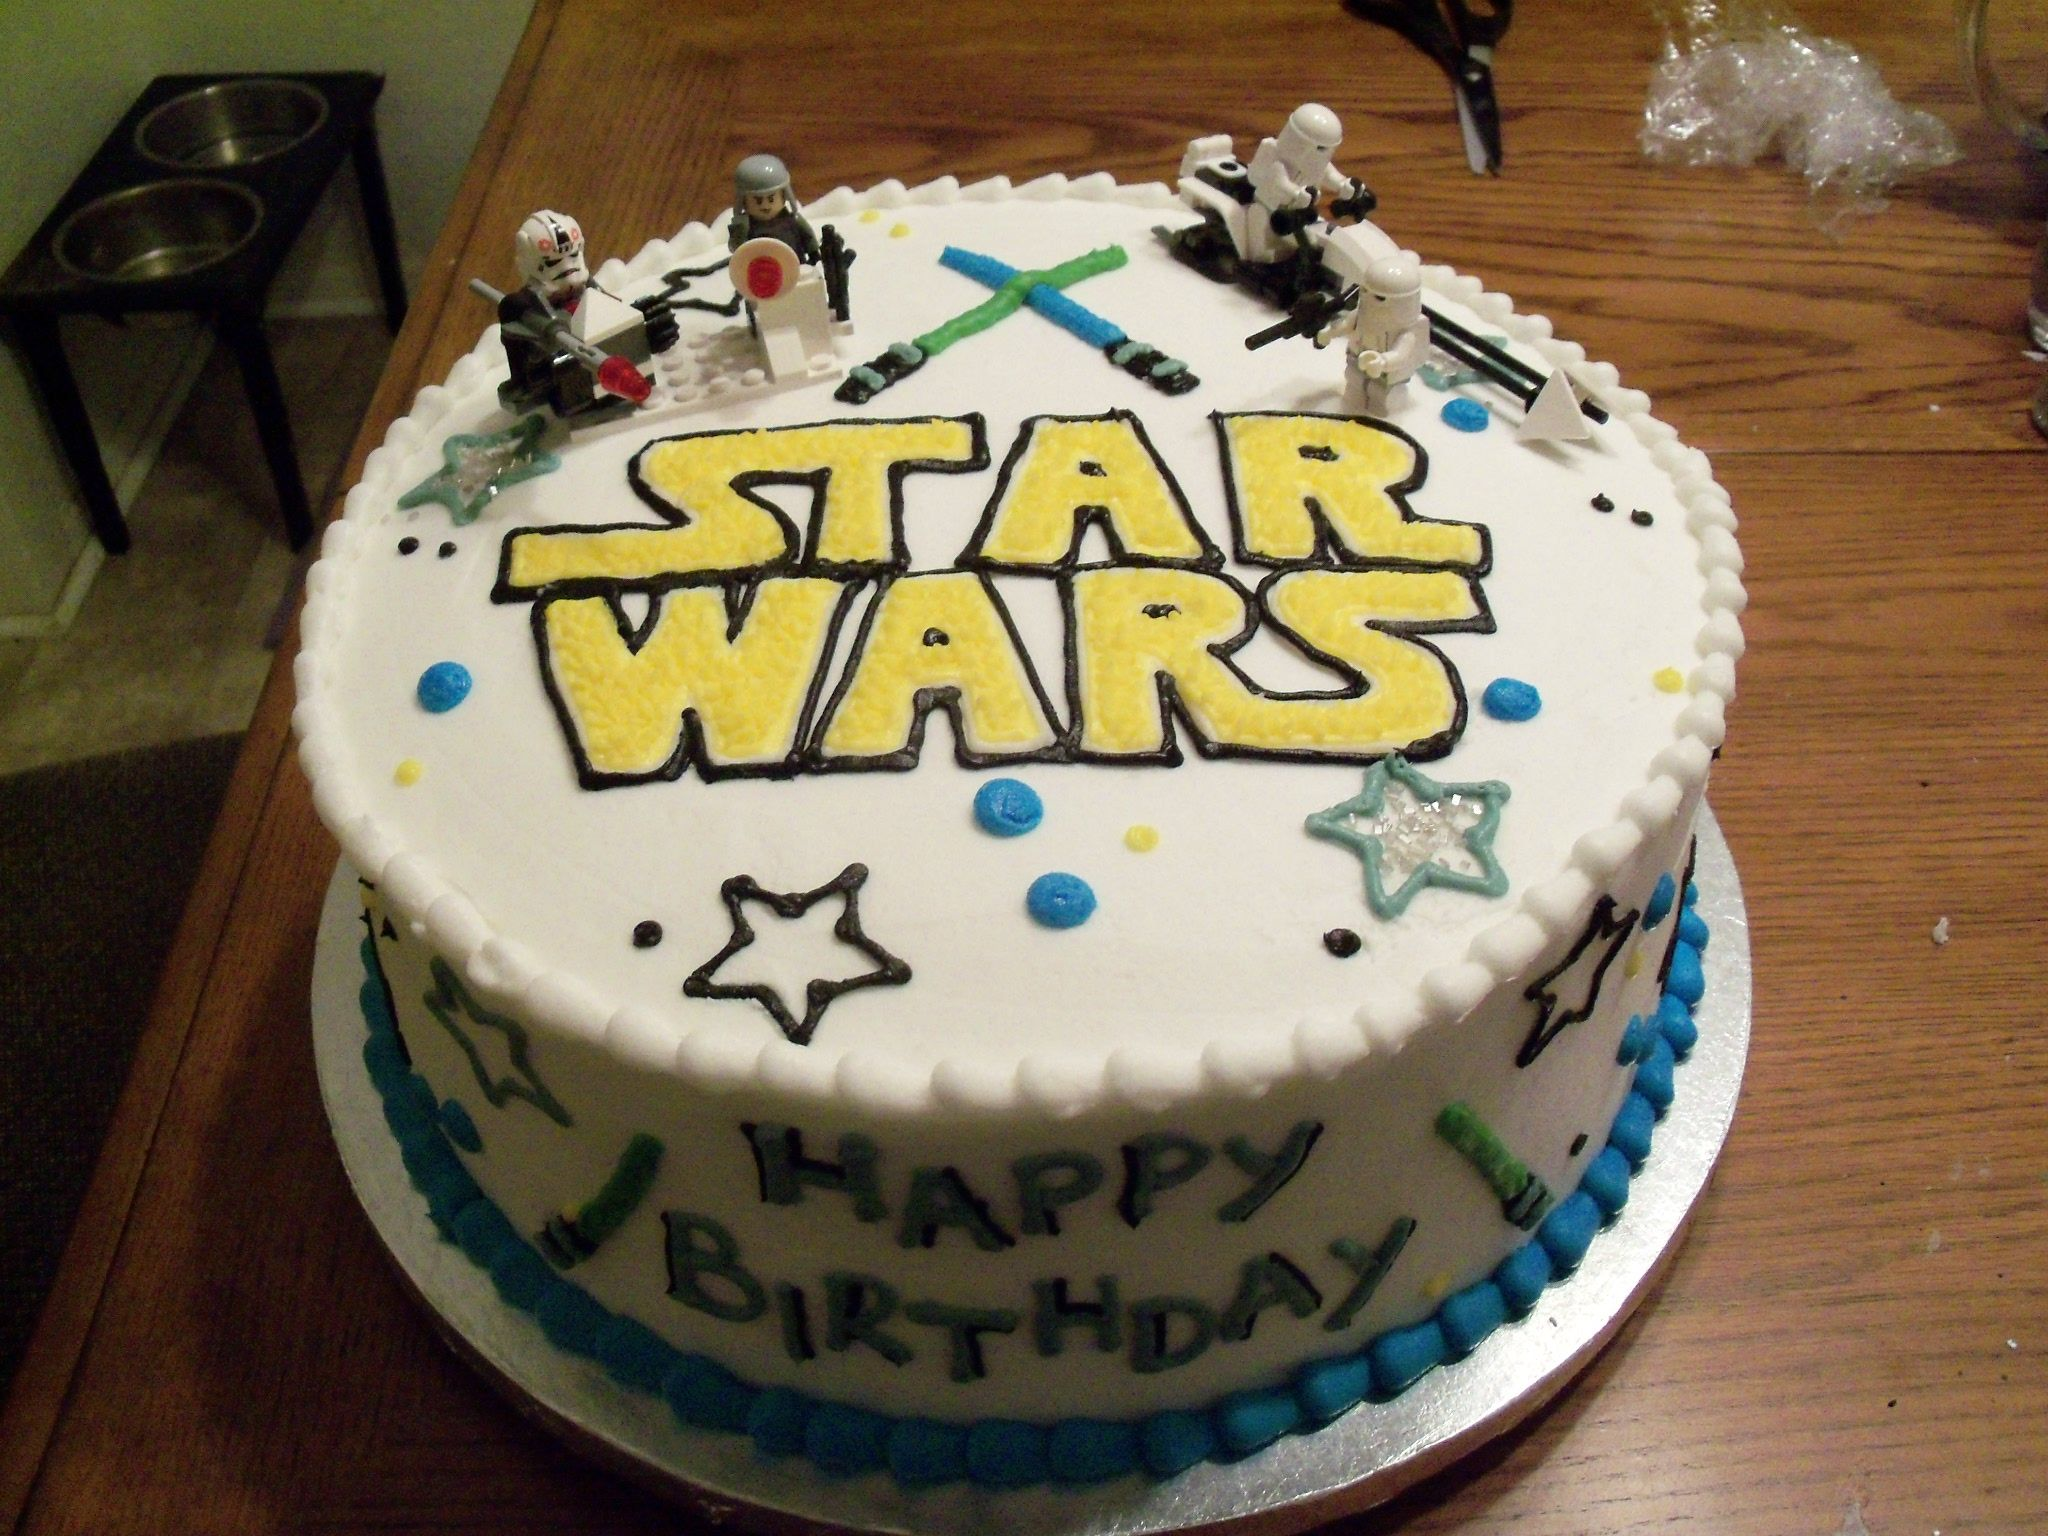 Homemade Star Wars Cake Http Cakecentral Com G I 1707156 Star